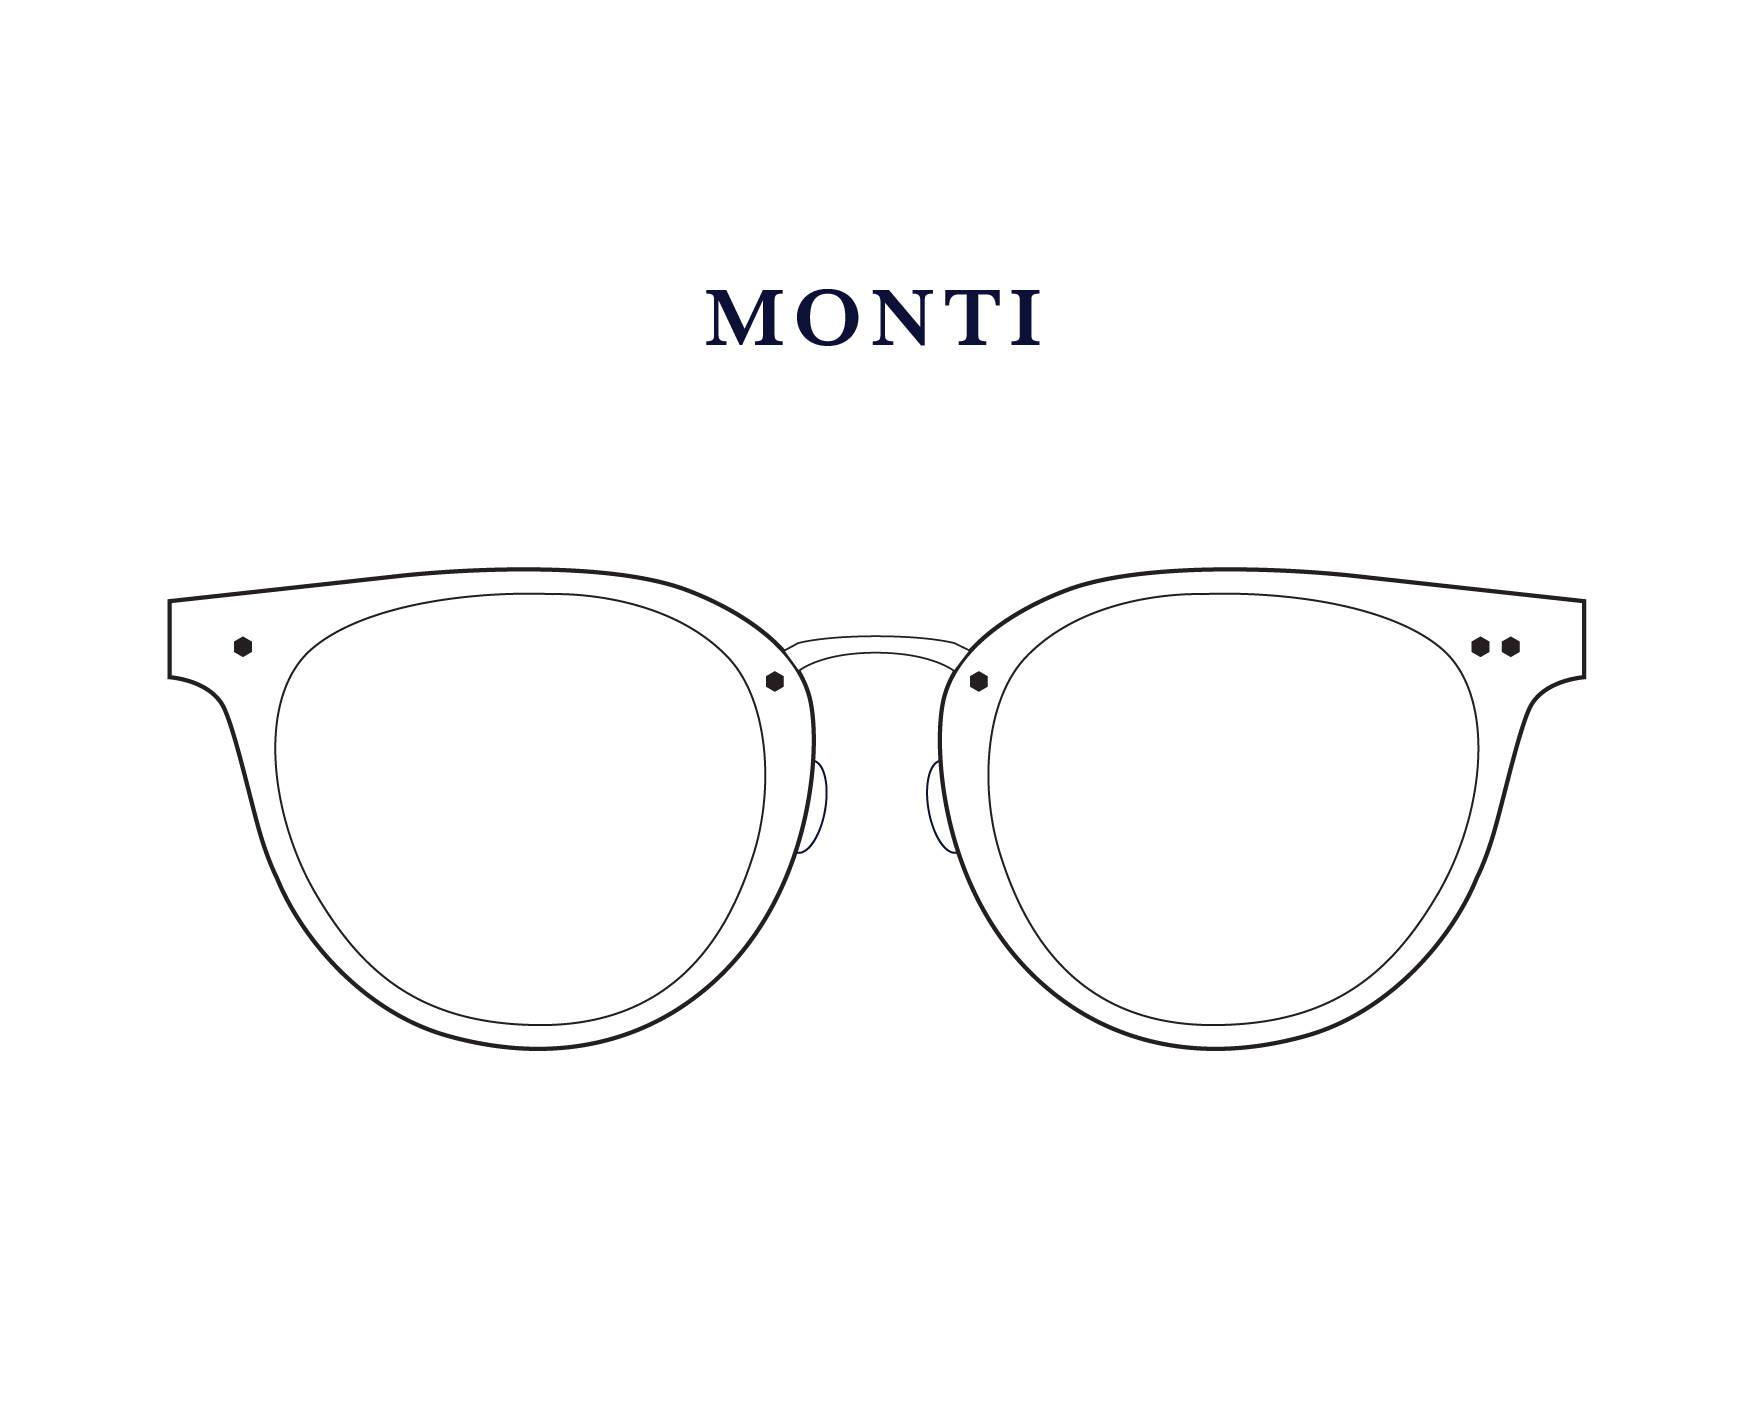 Monti Drawing